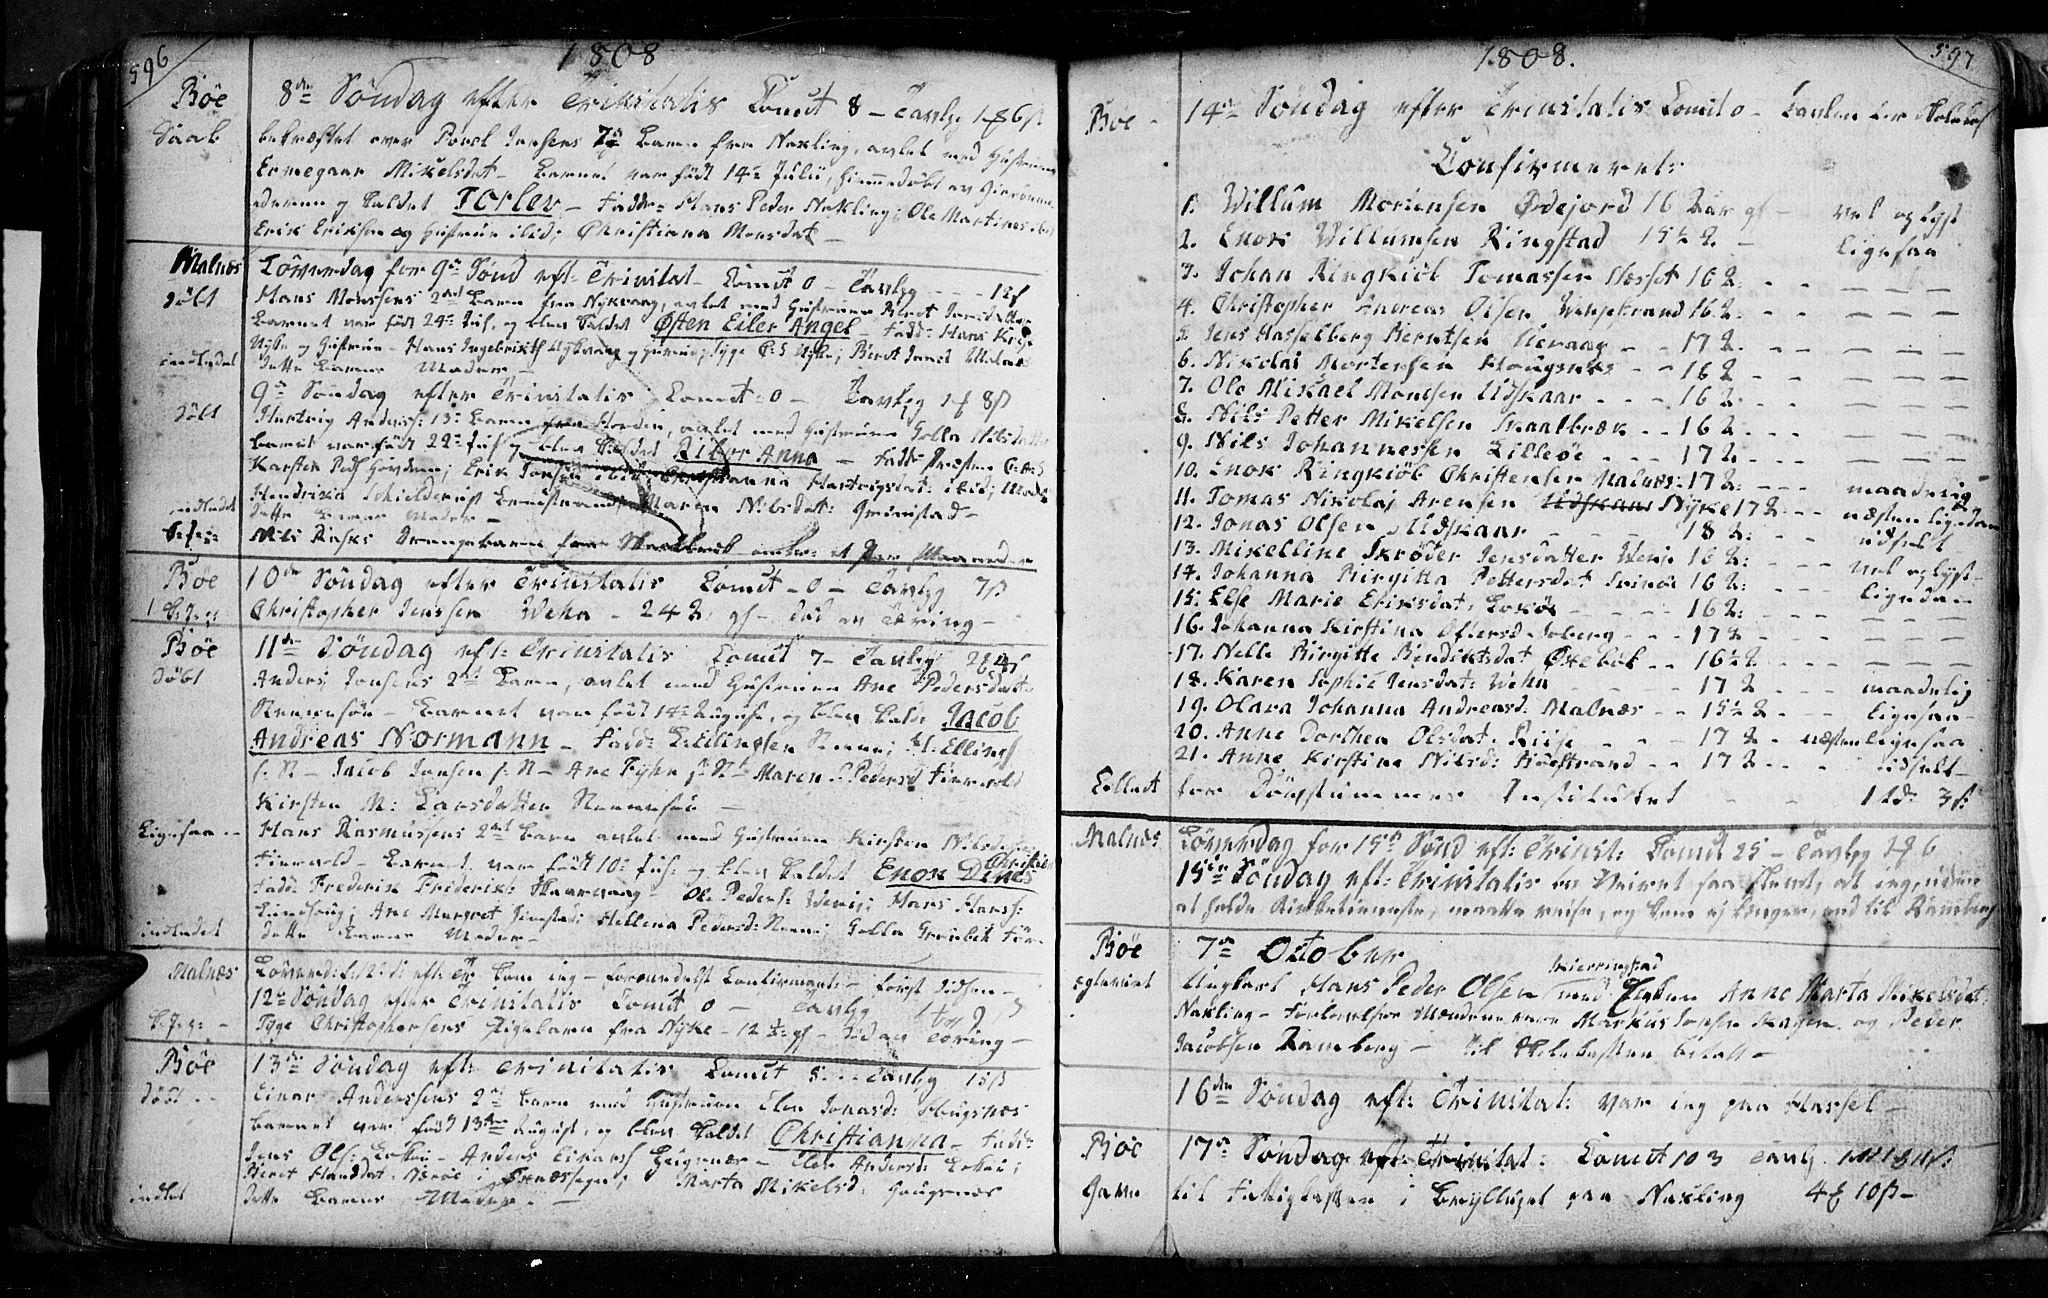 SAT, Ministerialprotokoller, klokkerbøker og fødselsregistre - Nordland, 891/L1297: Ministerialbok nr. 891A02, 1759-1820, s. 596-597